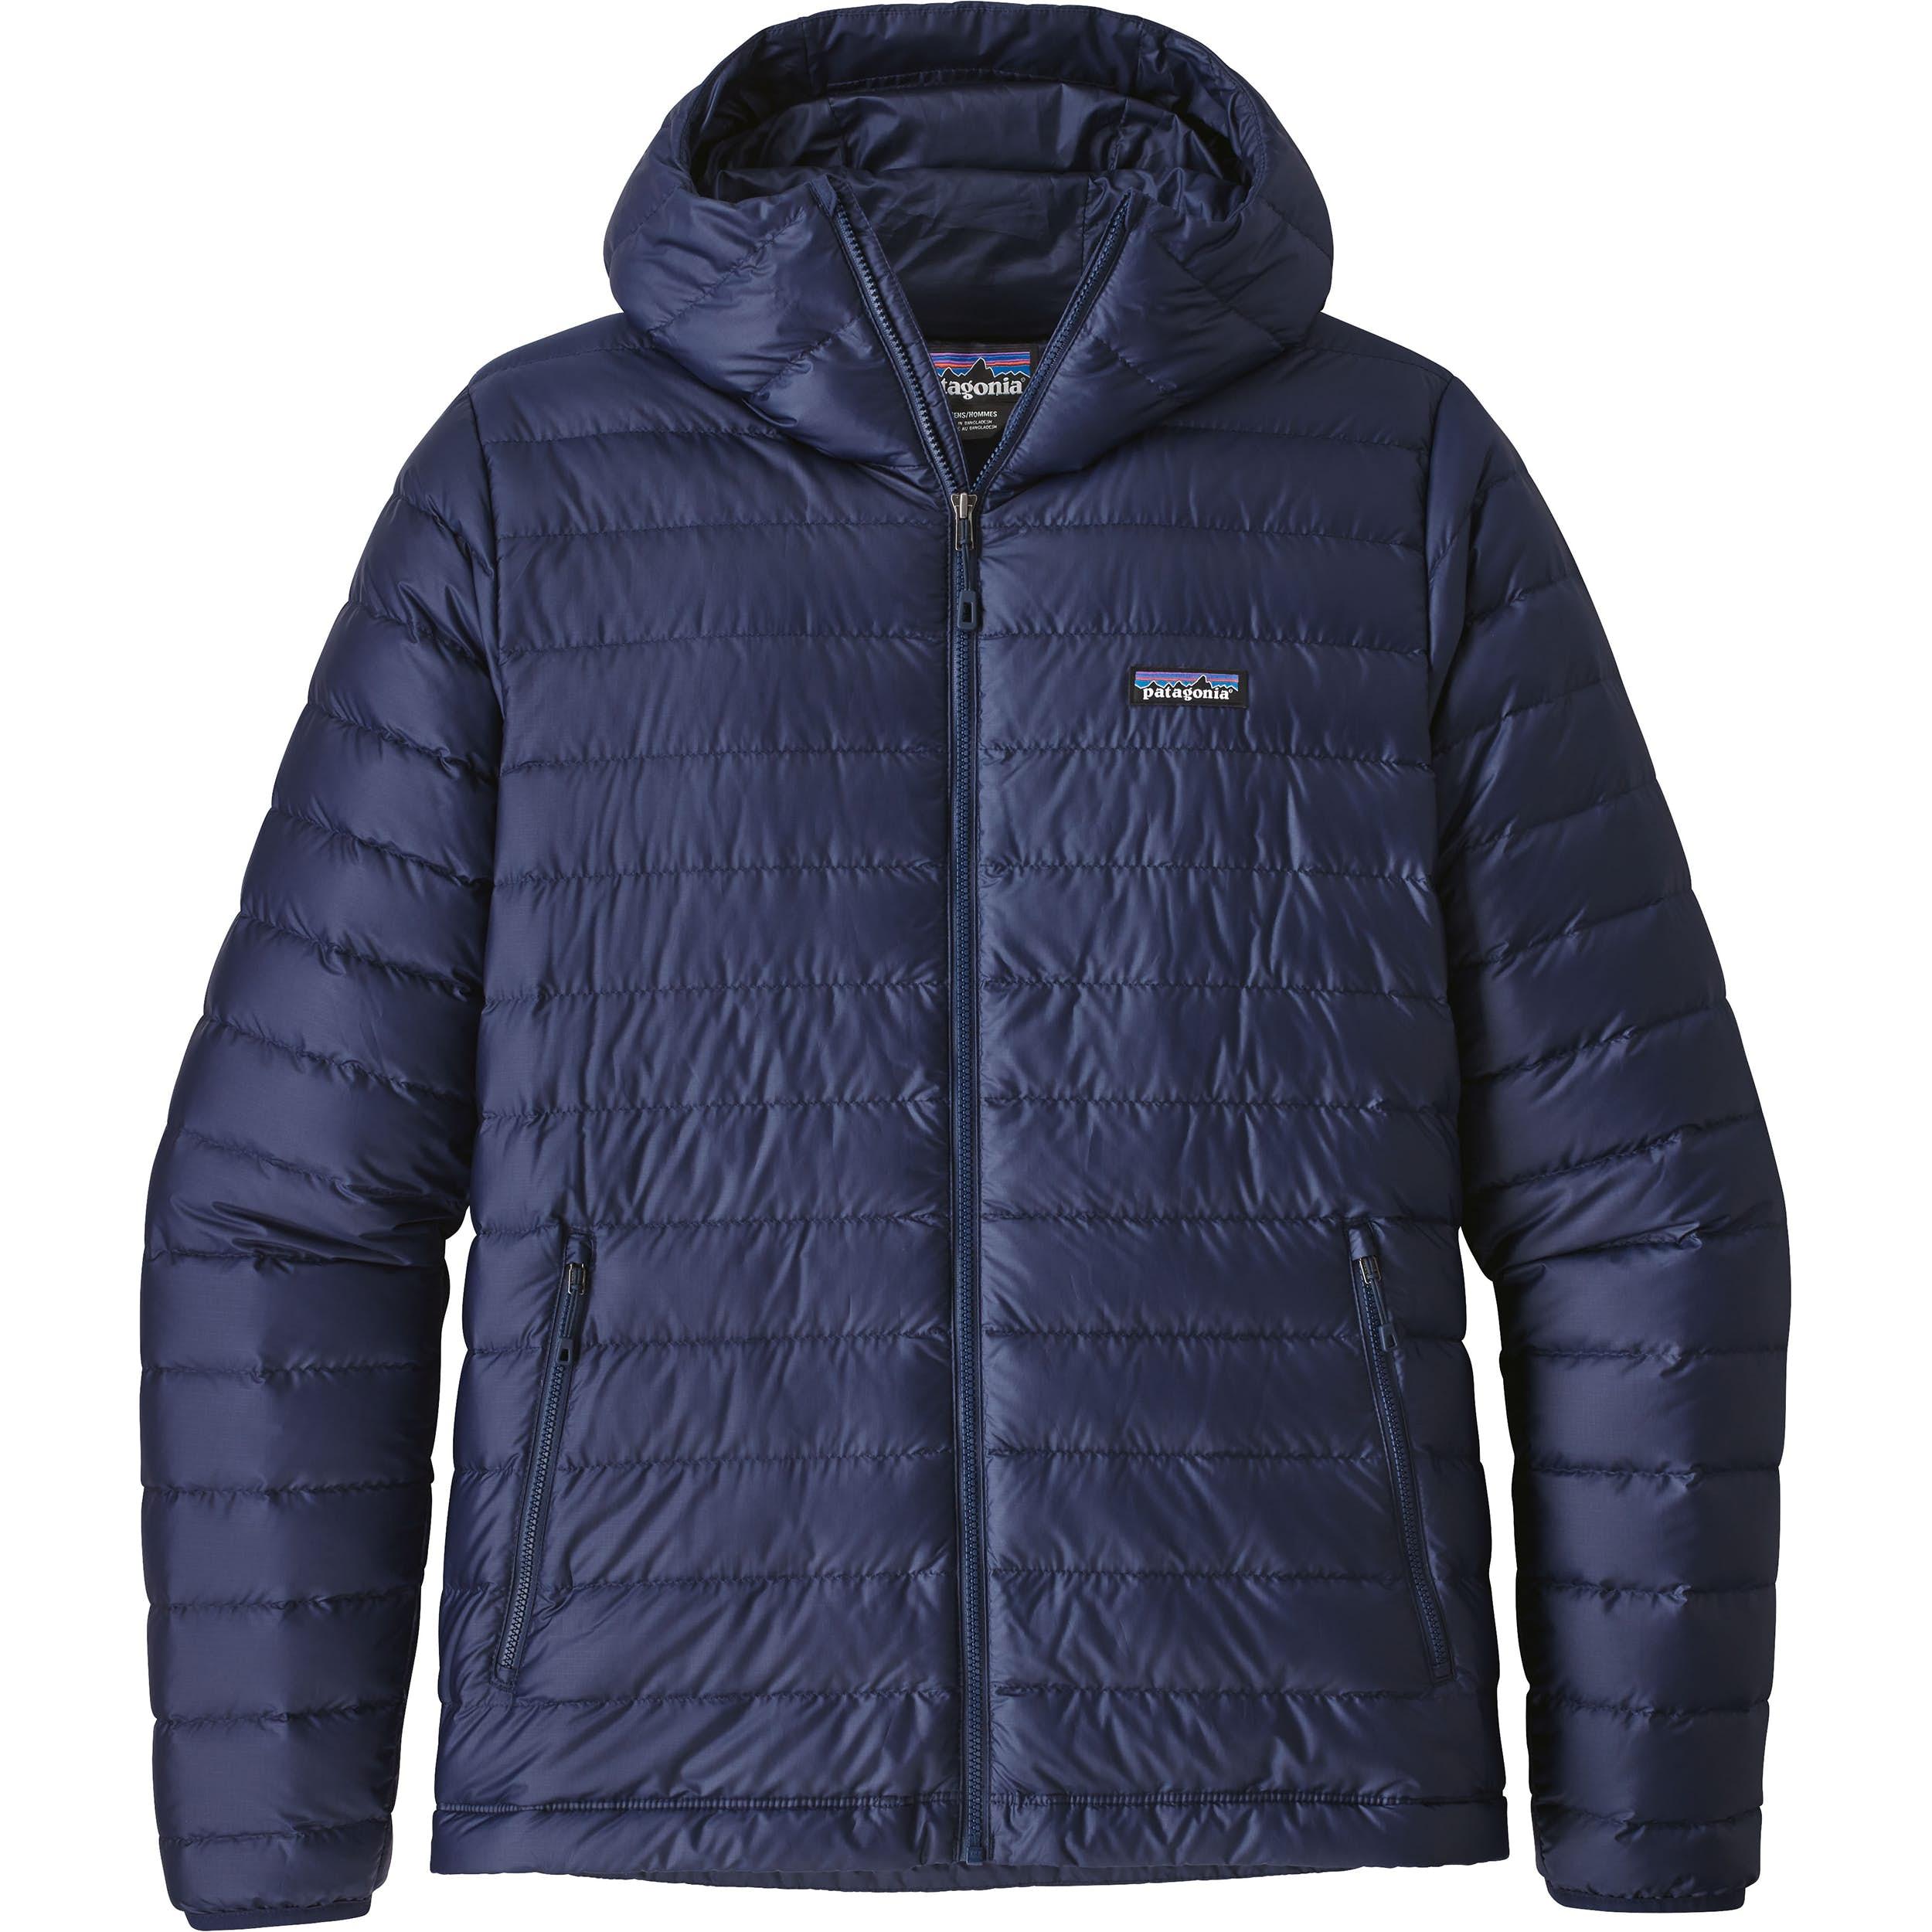 Patagonia Men's Down Sweater Hoody Jacket - Classic Navy ...